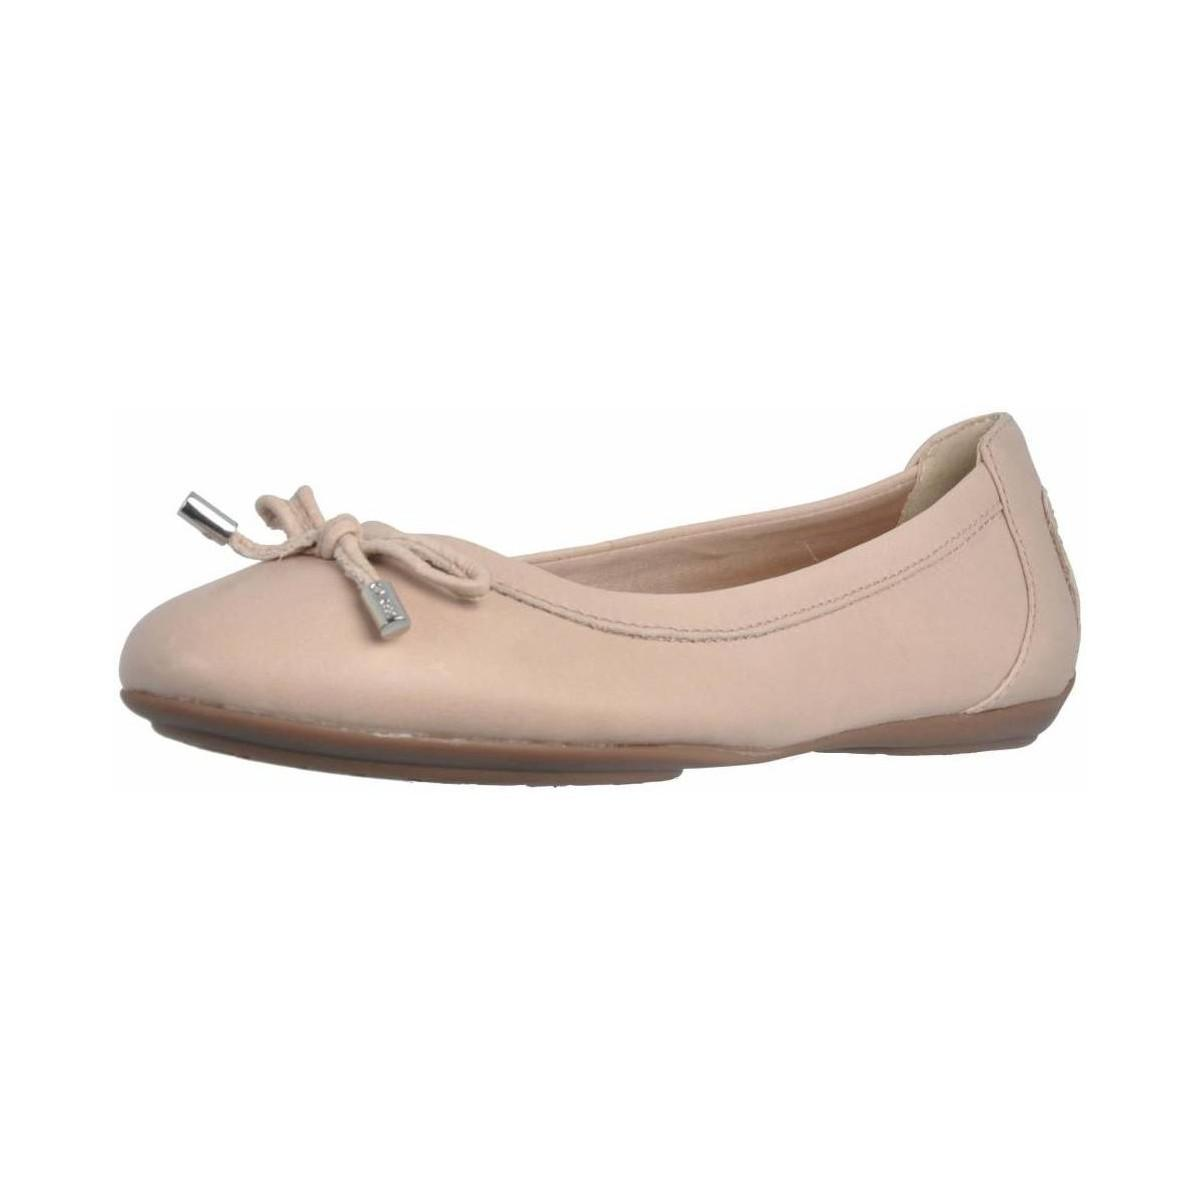 Geox D Charlene Charlene D A Damens's Schuhes (pumps   Ballerinas) In Beige in 1db485